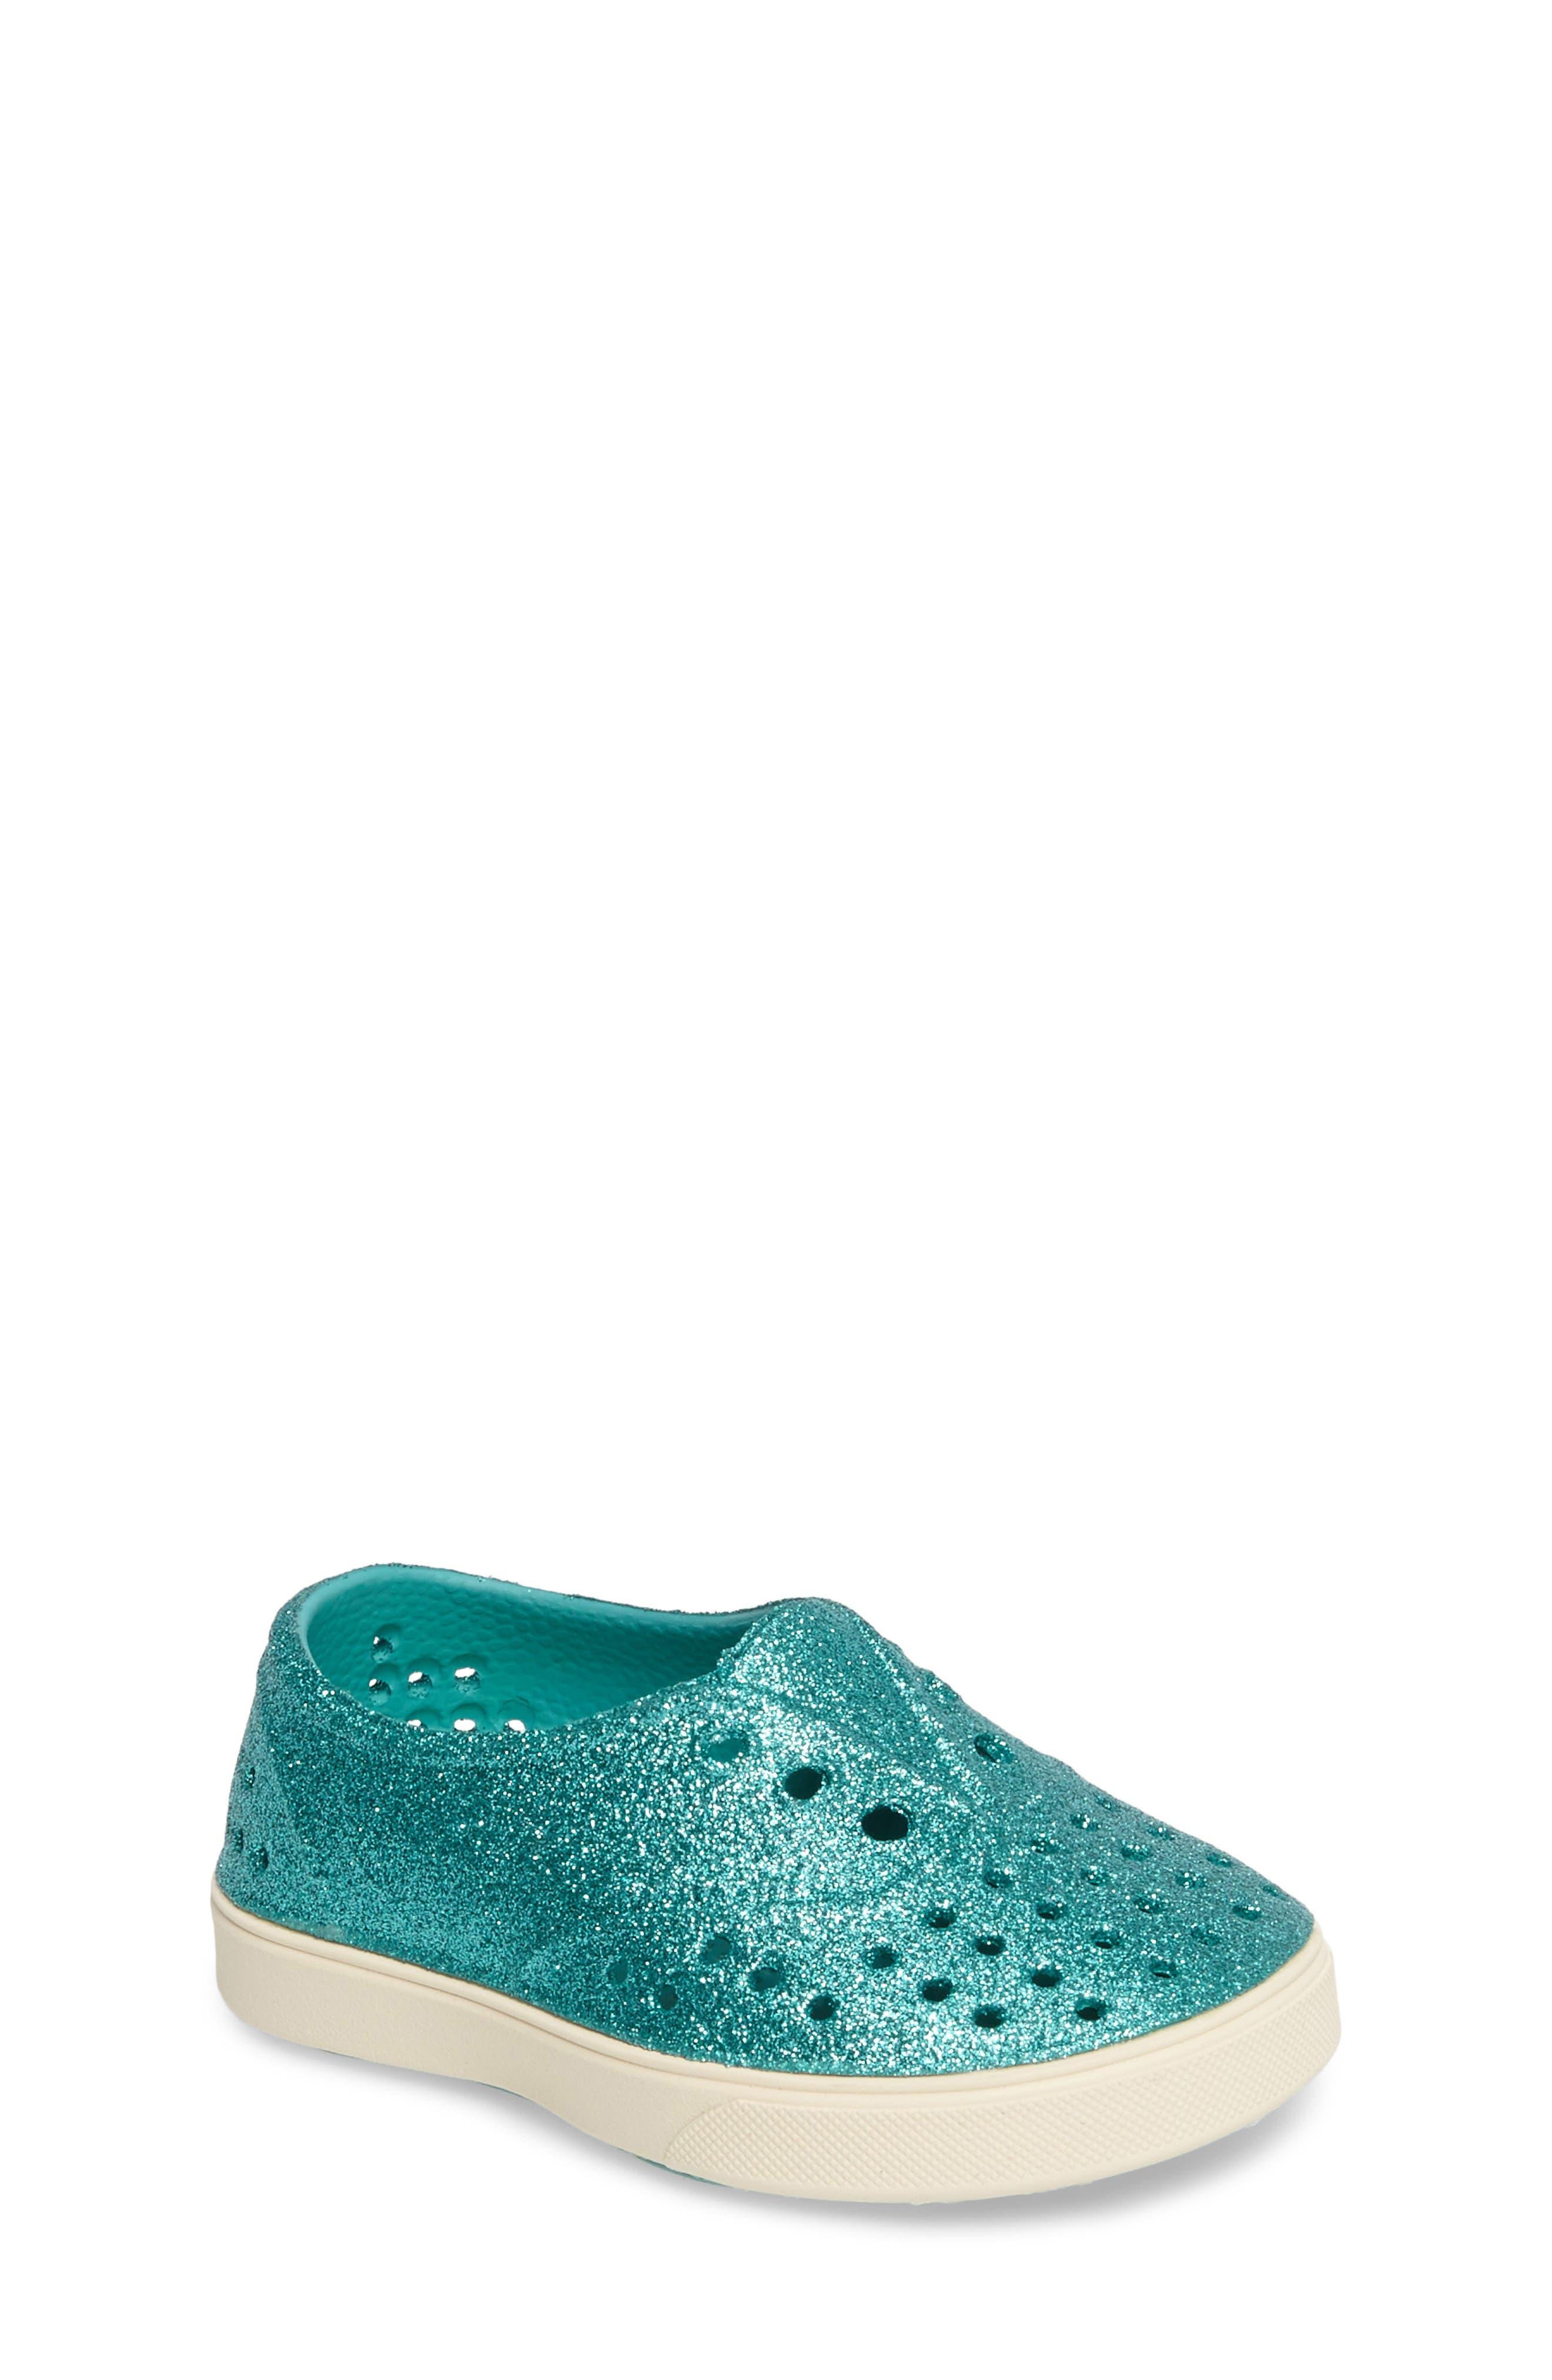 Alternate Image 1 Selected - Native Shoes Miller Sparkly Perforated Slip-On (Walker, Toddler & Little Kid)